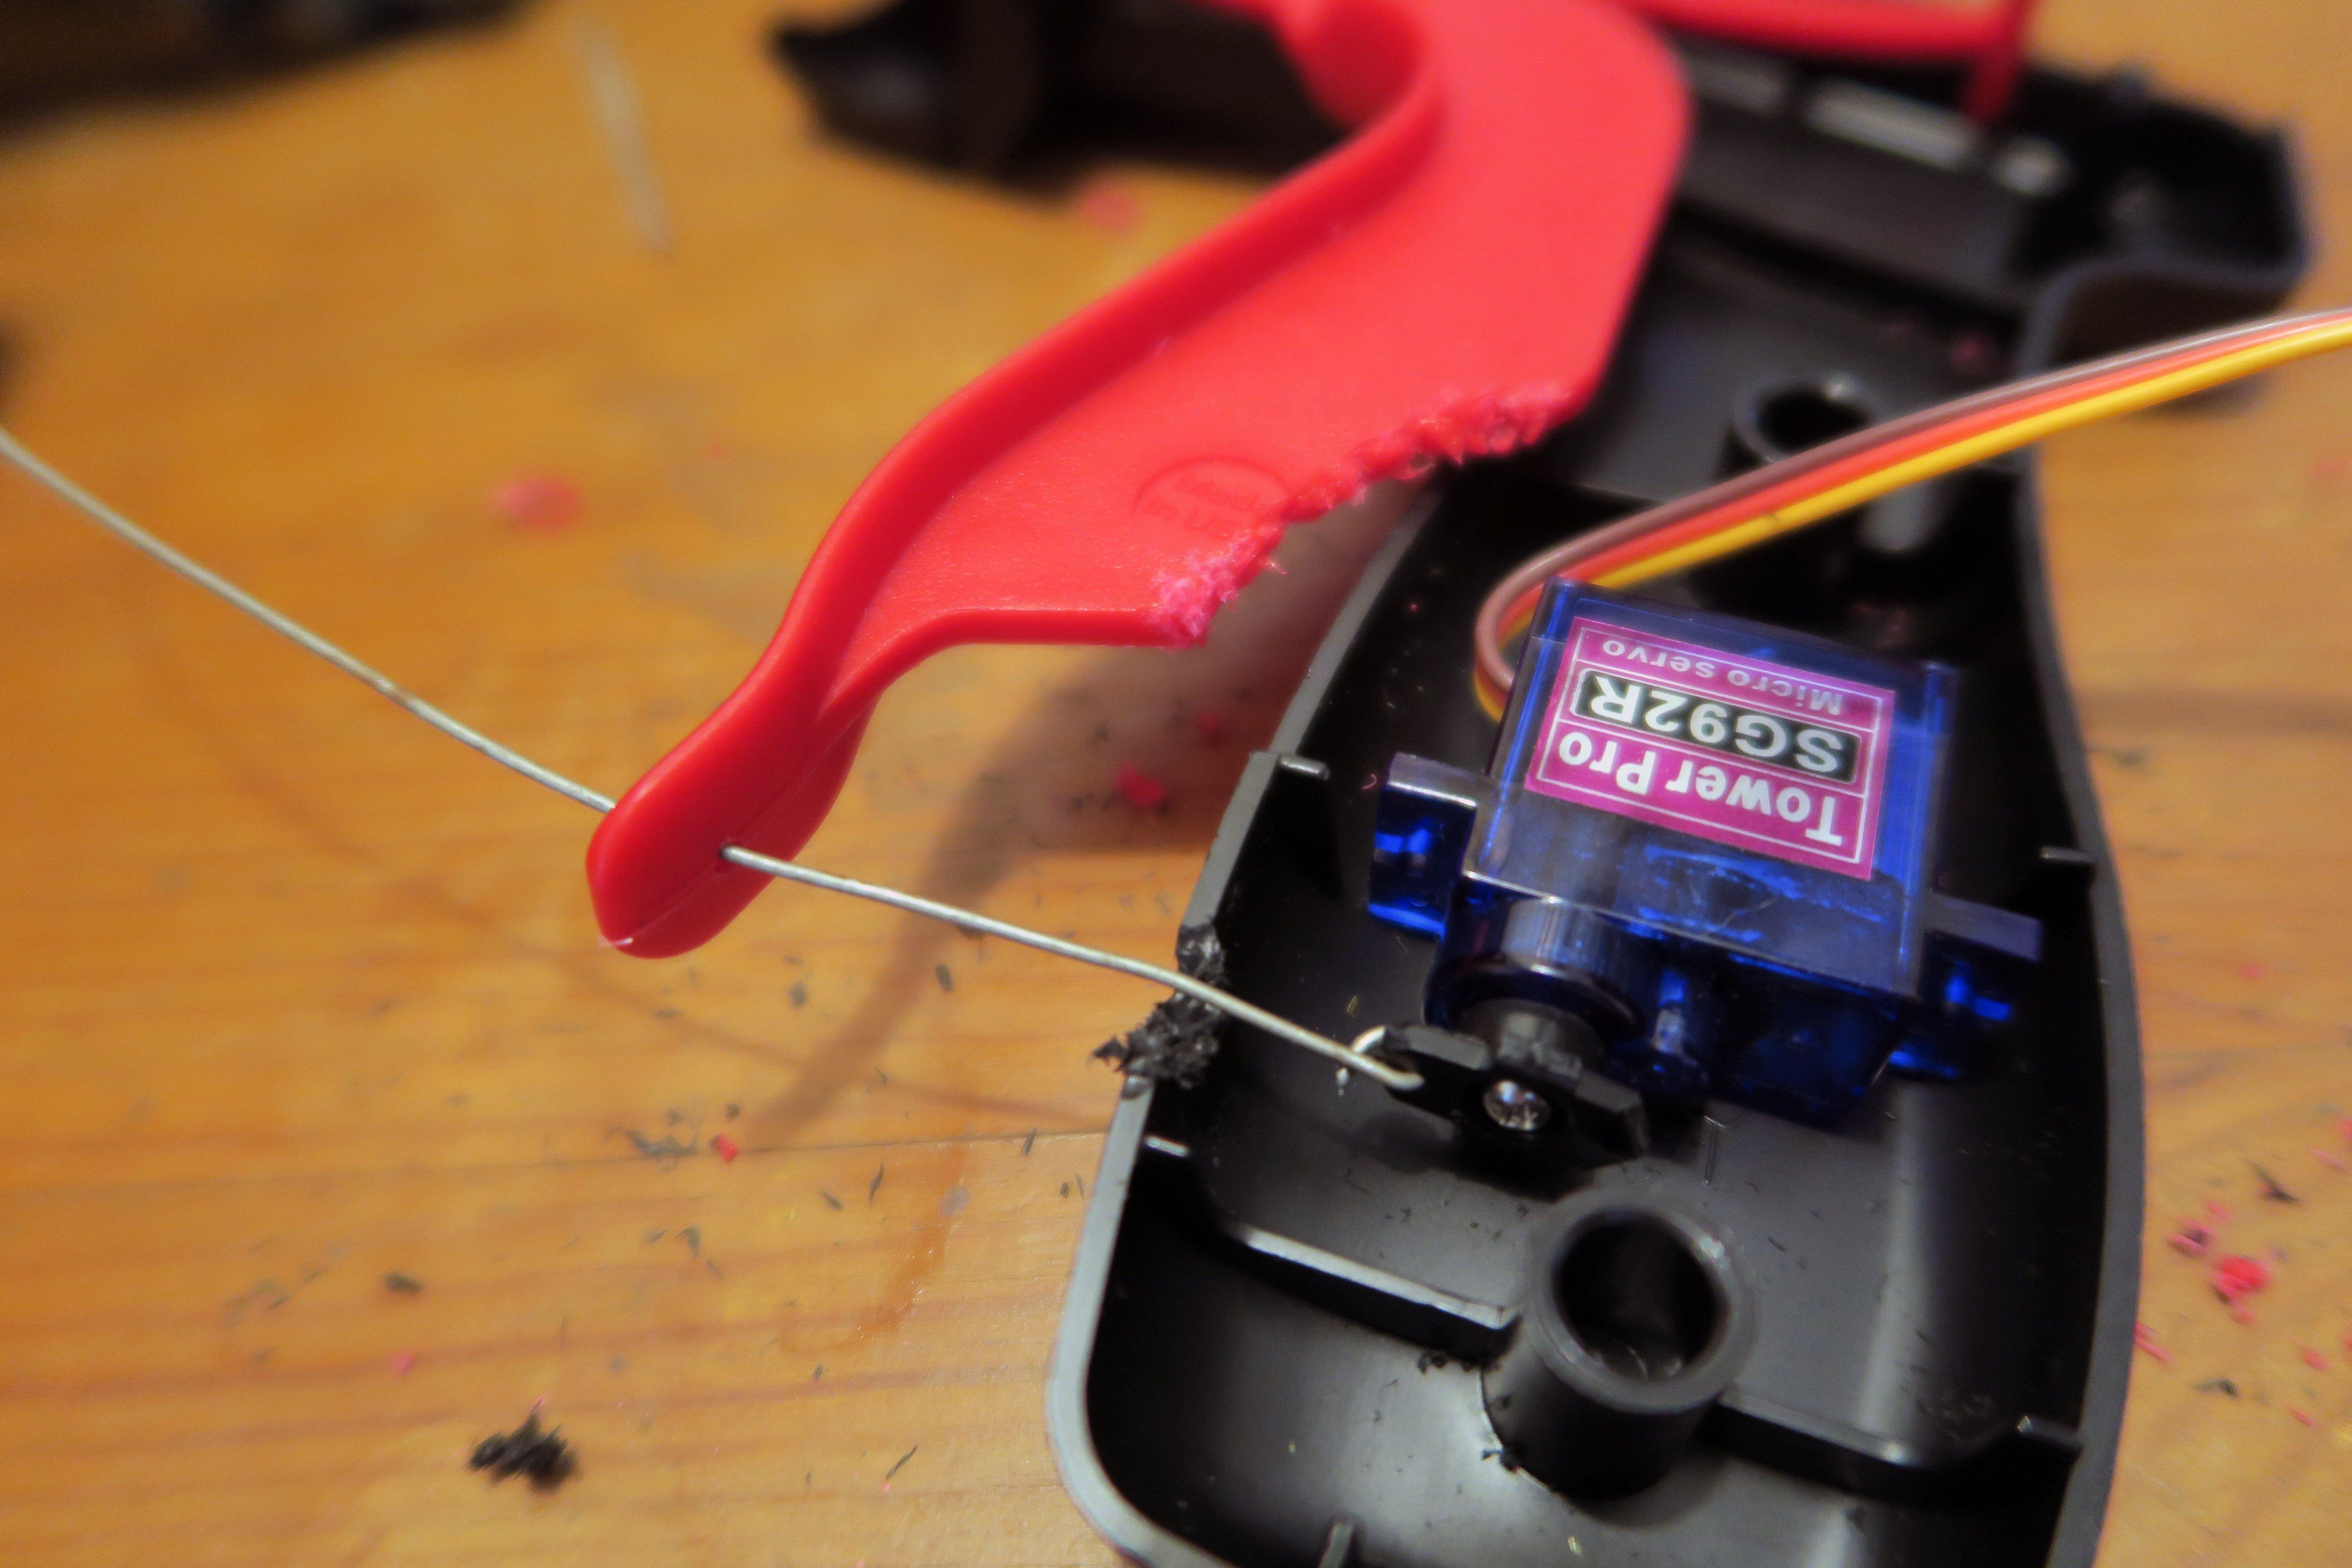 hacks_drone-spray-can-gun-servo-wire.jpg